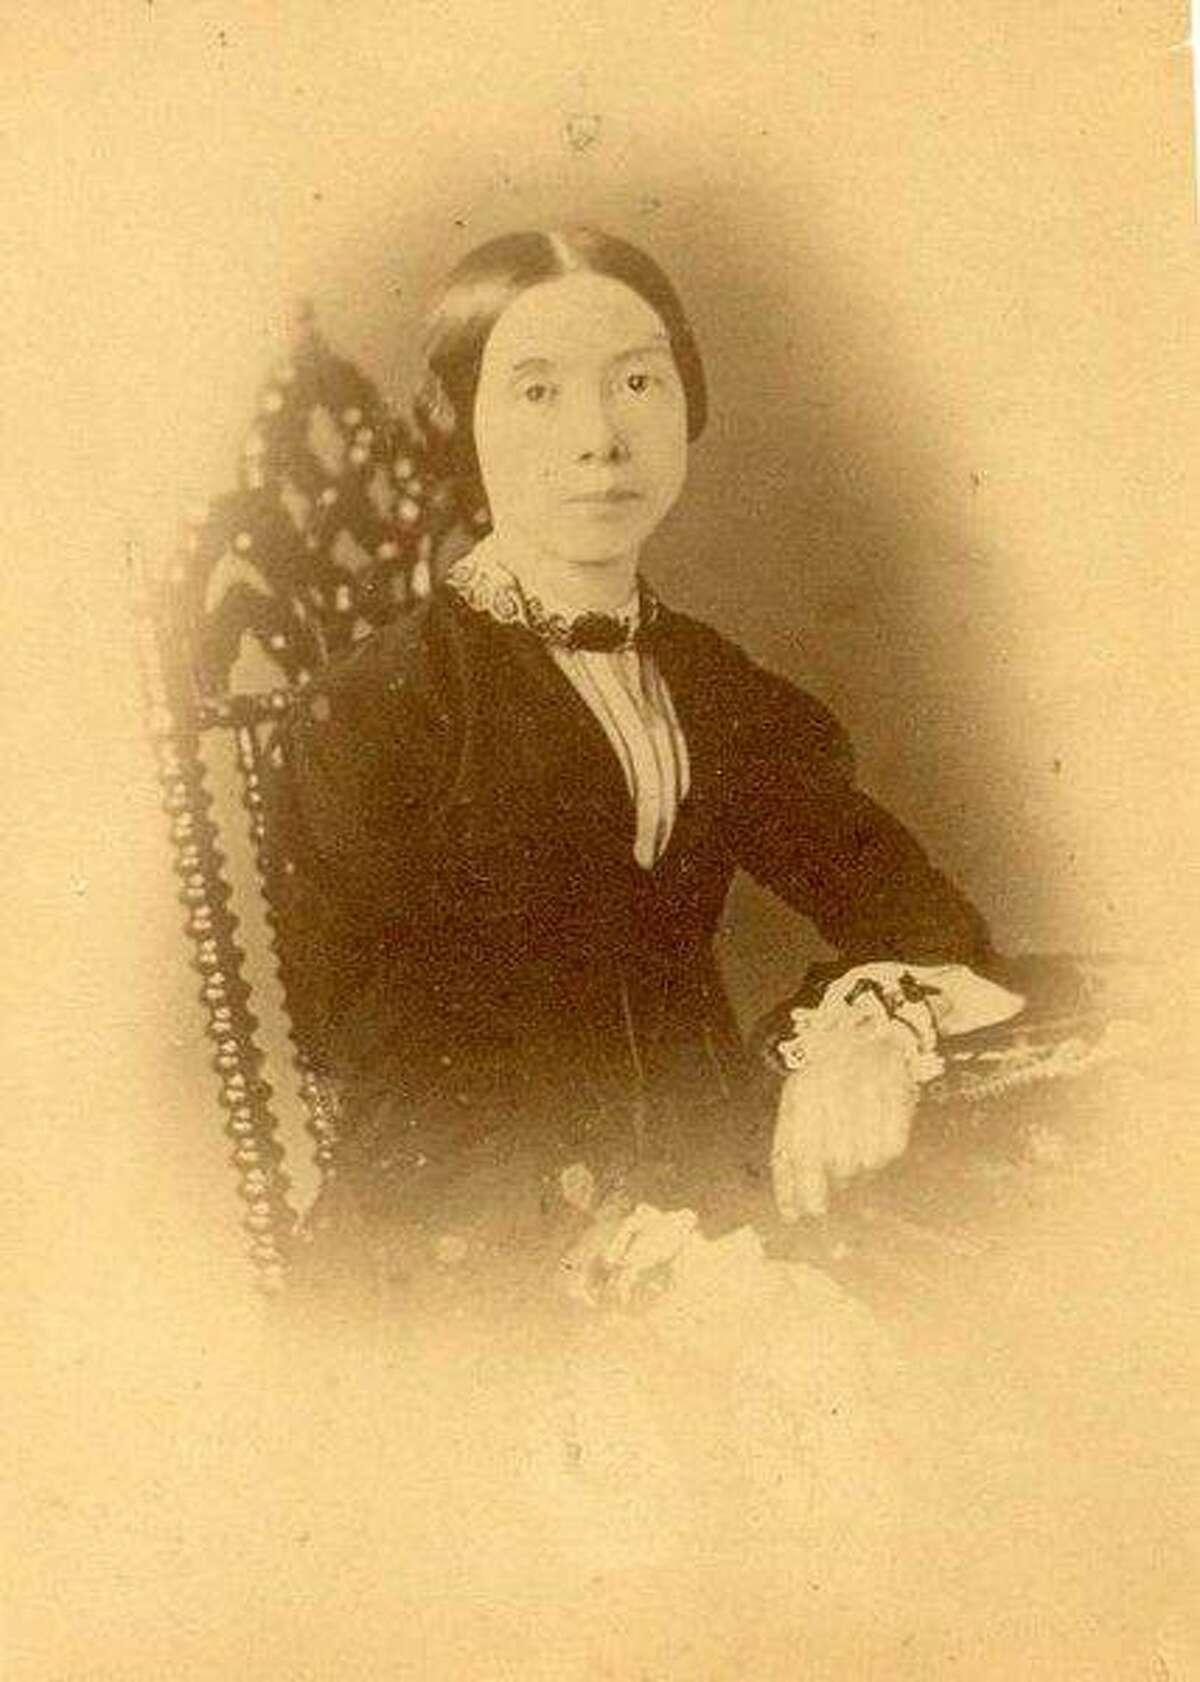 Emily Dickinson, perhaps the greatest American poet.